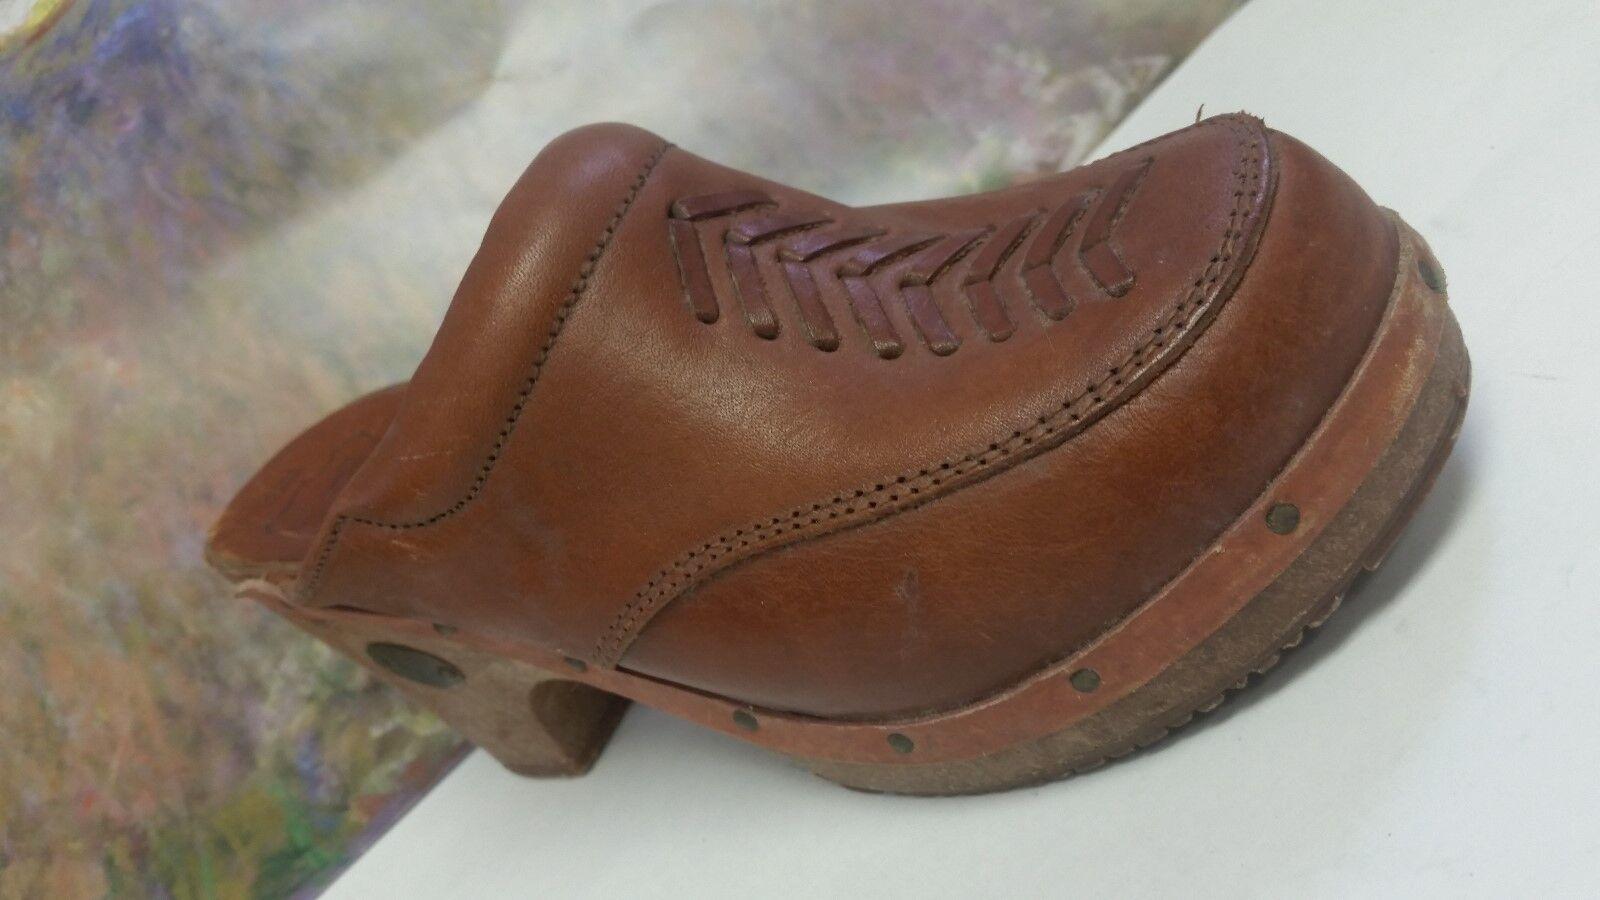 Vintage Rapallo Clogs Größe 7 Wooden Wedge Braun Leder Fantastic Condition